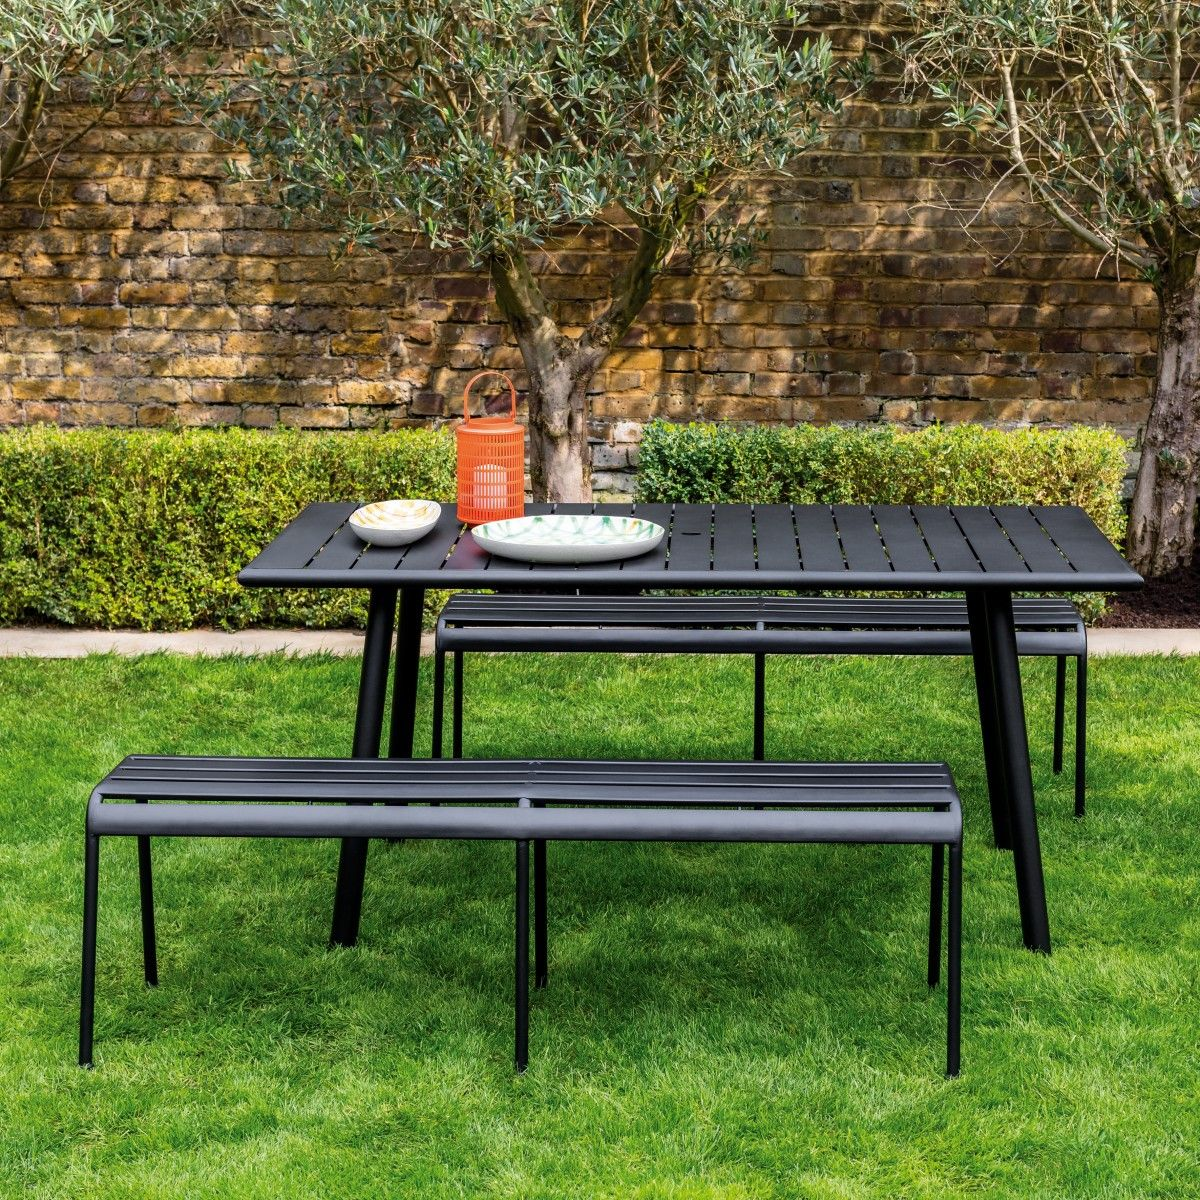 Darwin Black Metal 6 Seat Garden Dining Set Buy Now At Habitat Uk Metal Garden Table Metal Outdoor Table Garden Dining Set